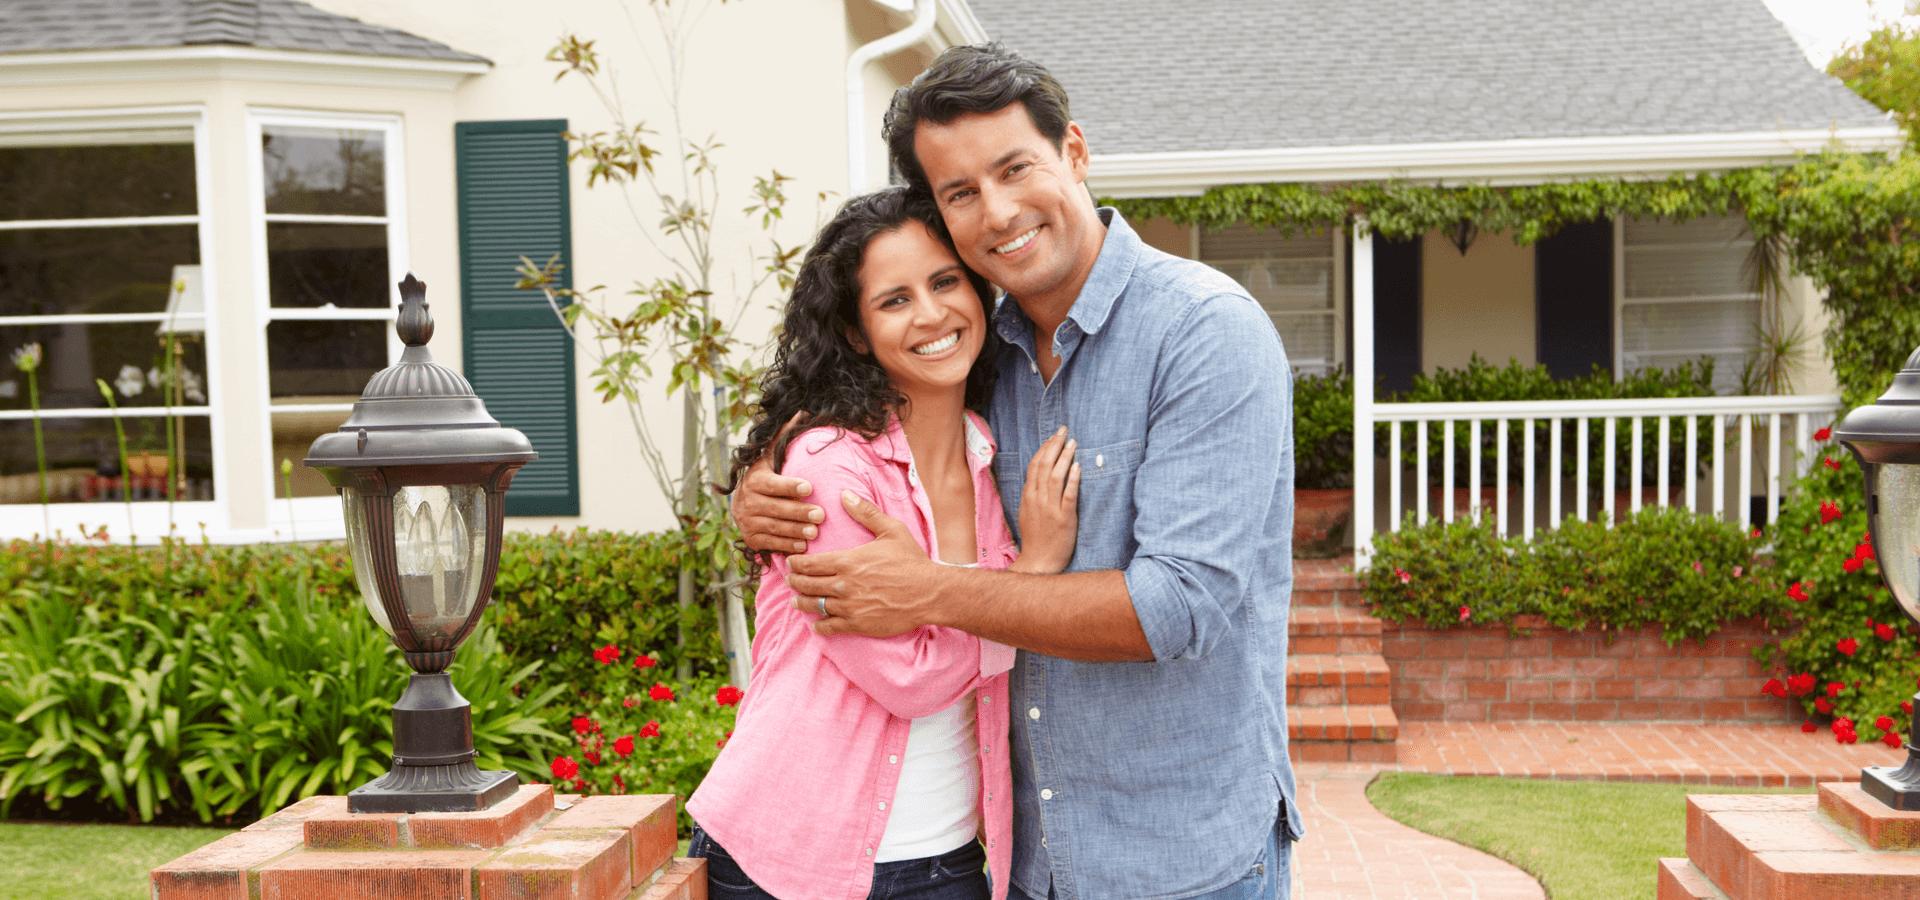 Homeowners Insurance World Insurance Associates Llc